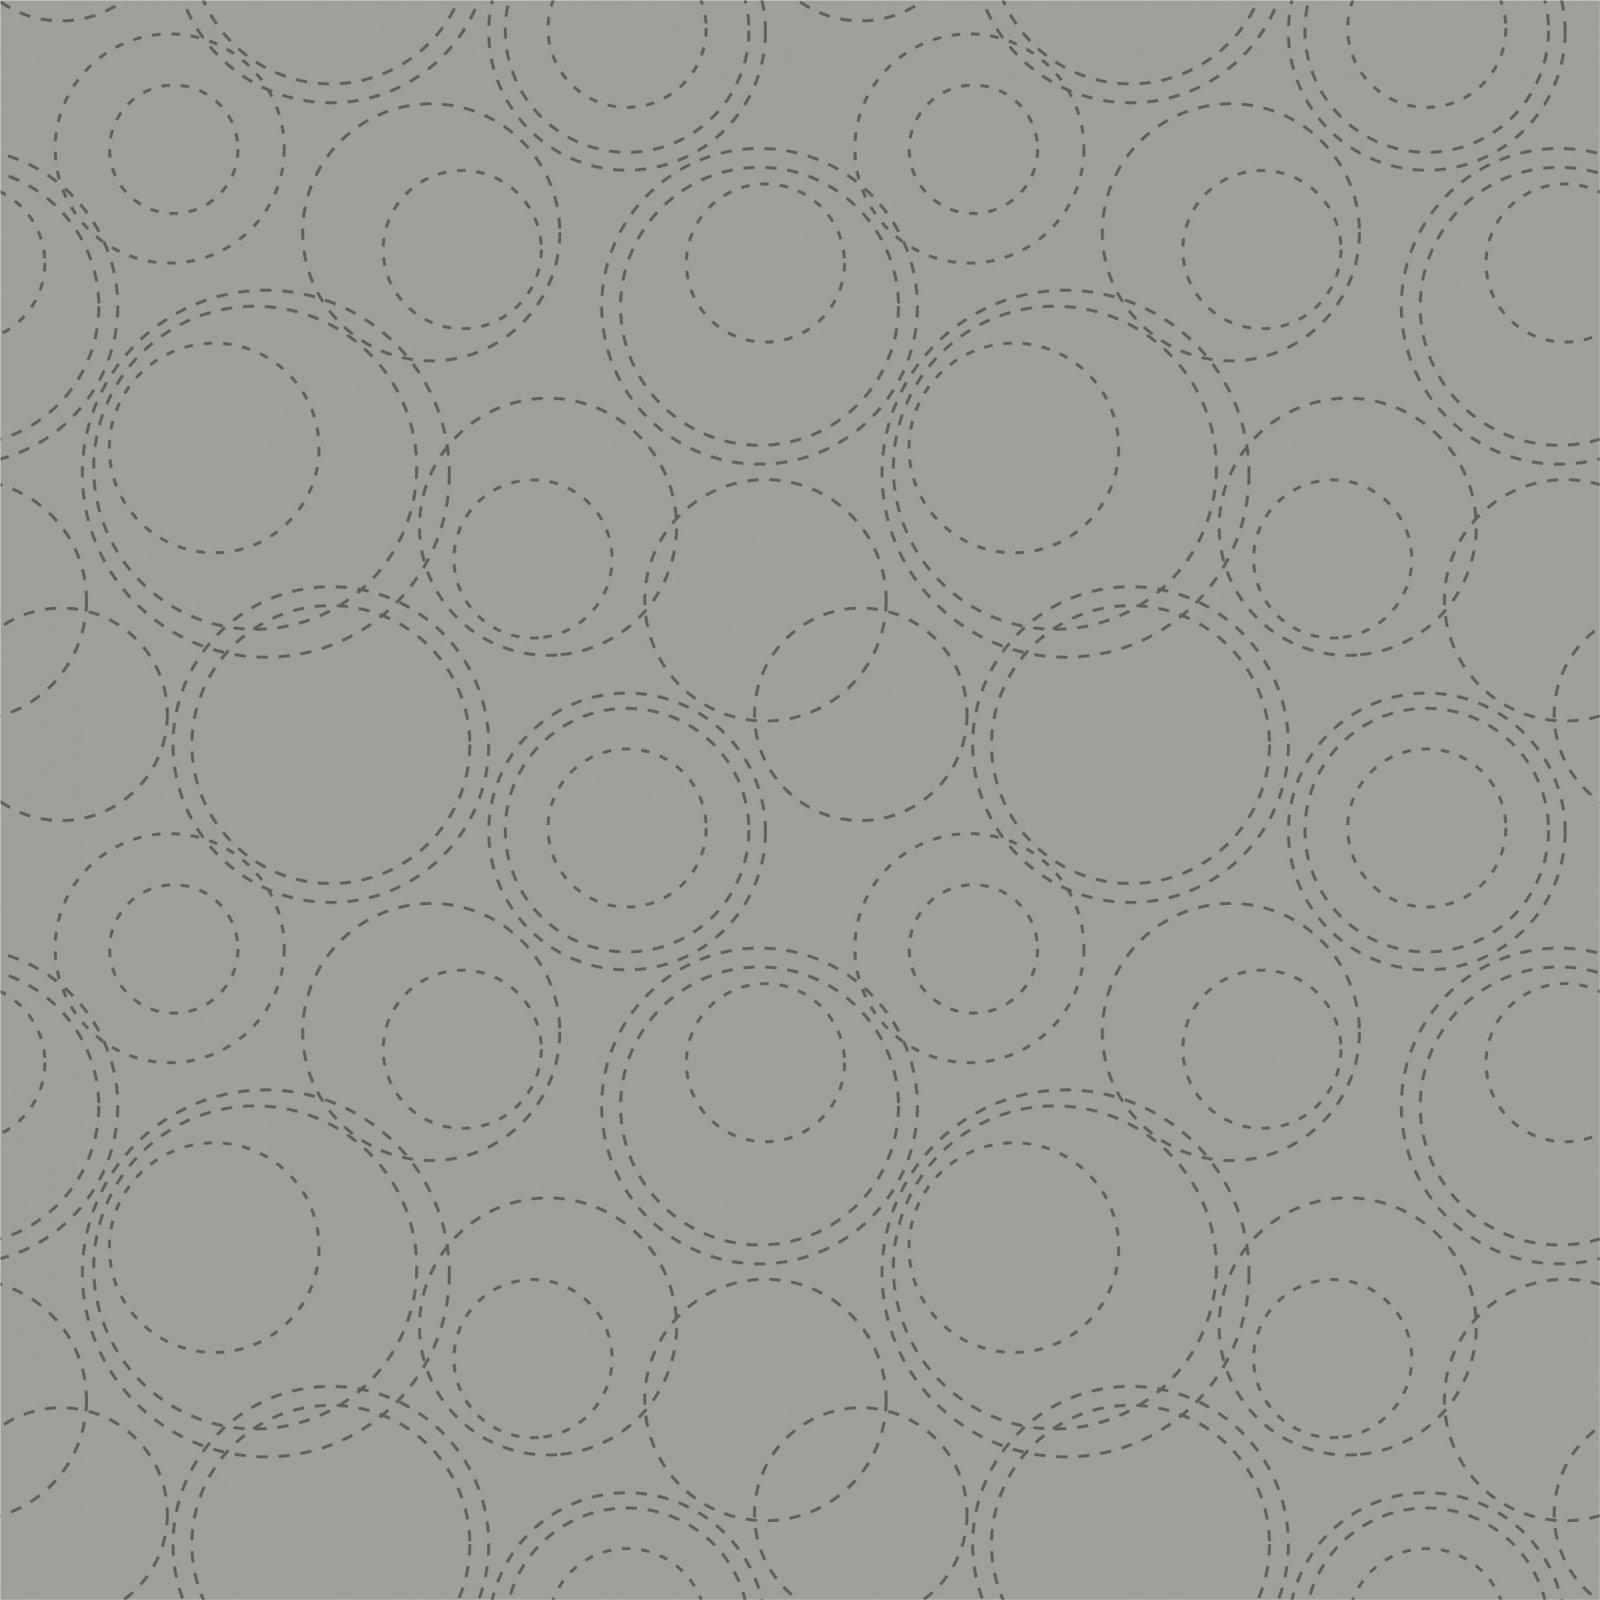 Shades of Grey 18503-GY